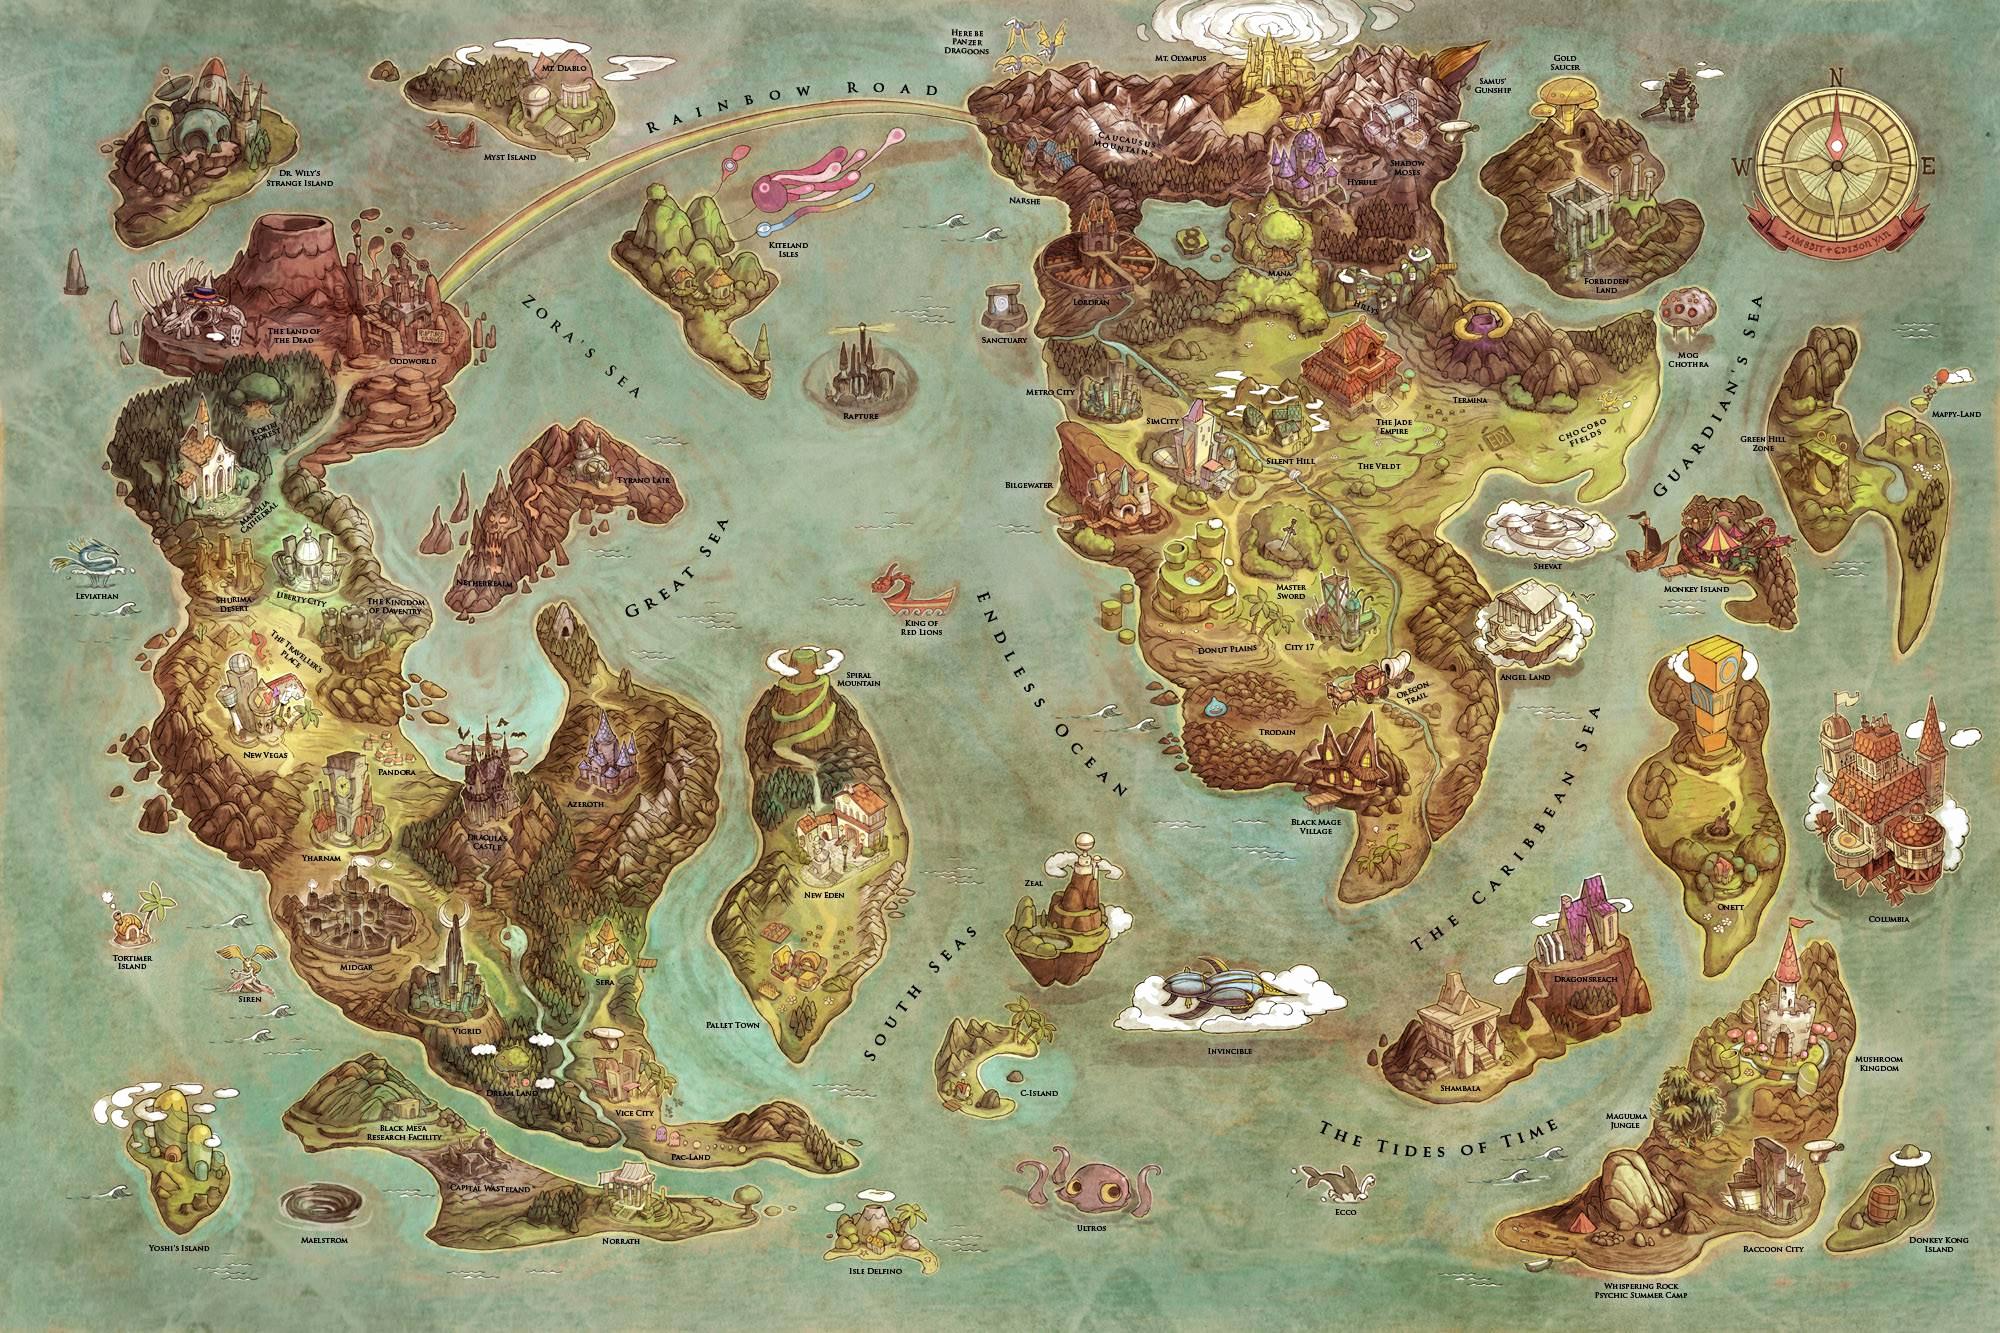 lit/ - Literature Zelda Wind Waker Full Map on the legend of zelda full map, wind waker world map, zelda ocarina of time full map, hyrule full map, wind waker islands map, the wind waker full map, zelda link to the past full map, wind waker triforce map, zelda majoras mask full map, zelda windwaker map complete, wind waker hd map,